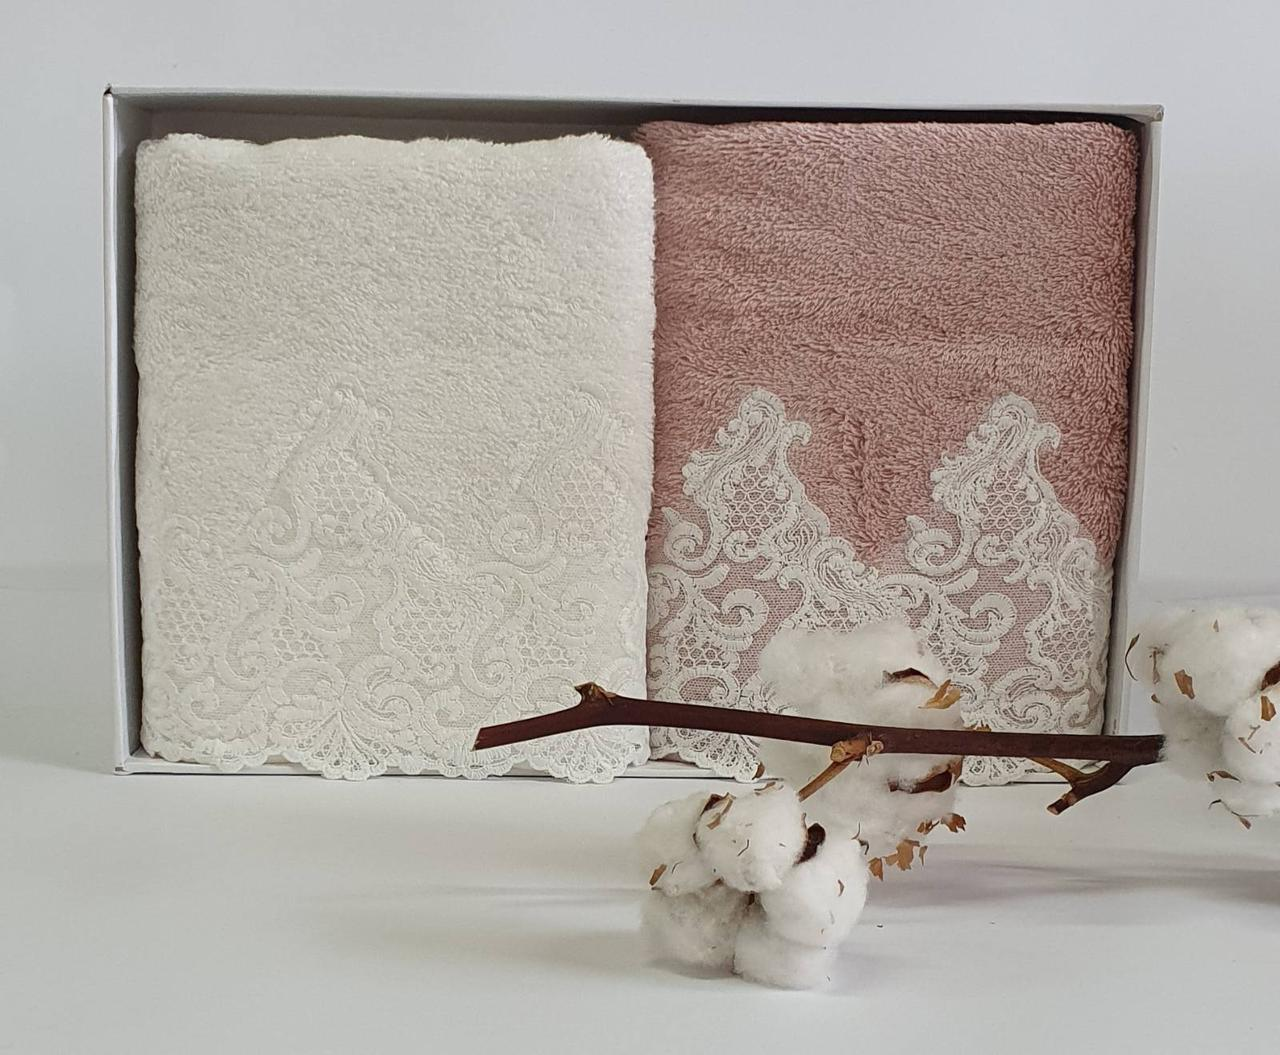 Рушники Maison d'or 2шт Jasmin Ecru Rose